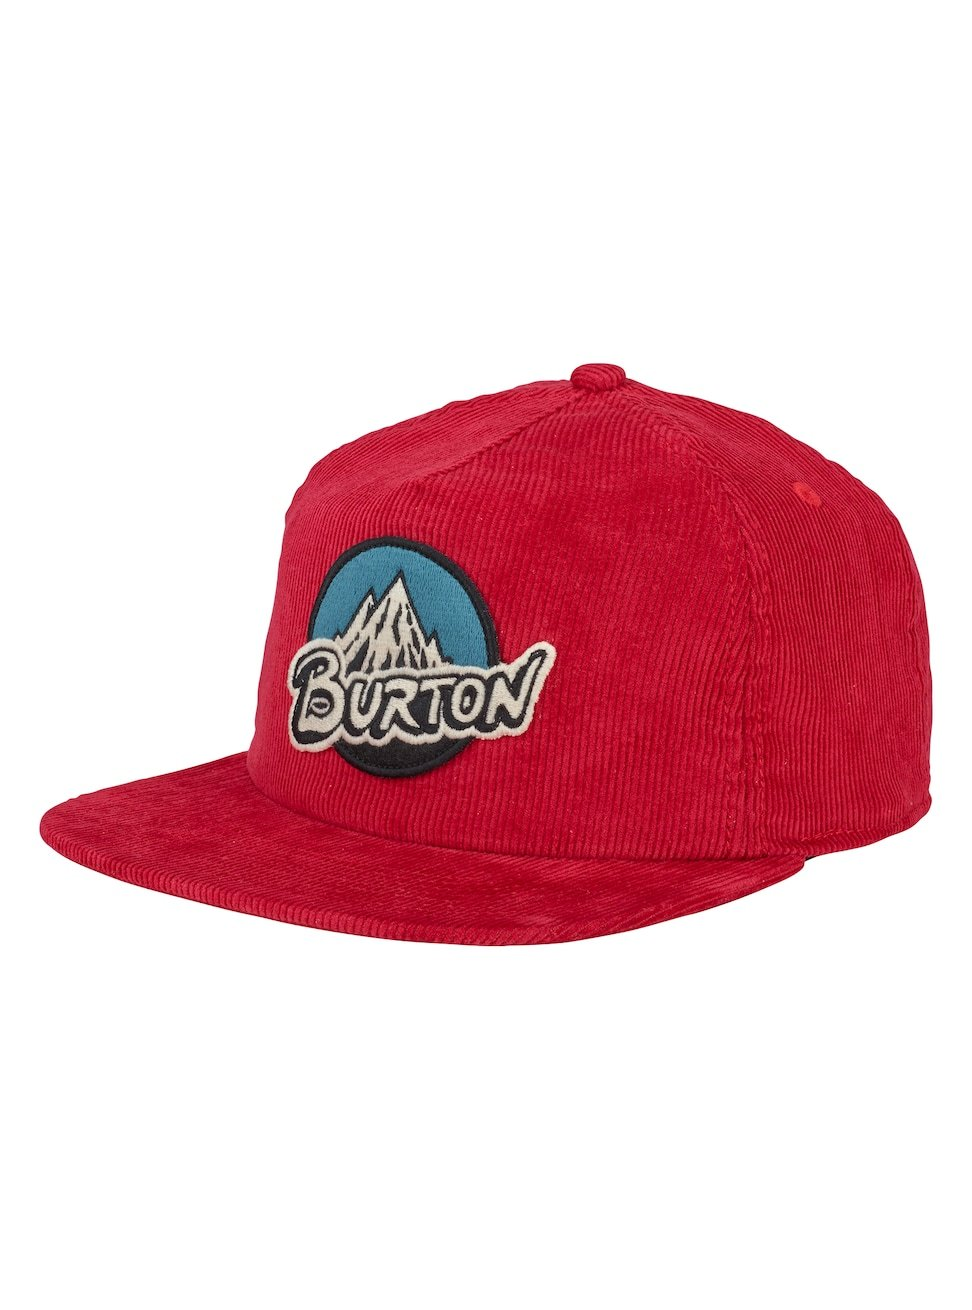 Burton Boys Youth Retro Mountain Hat, Fiery Red, One Size 189091